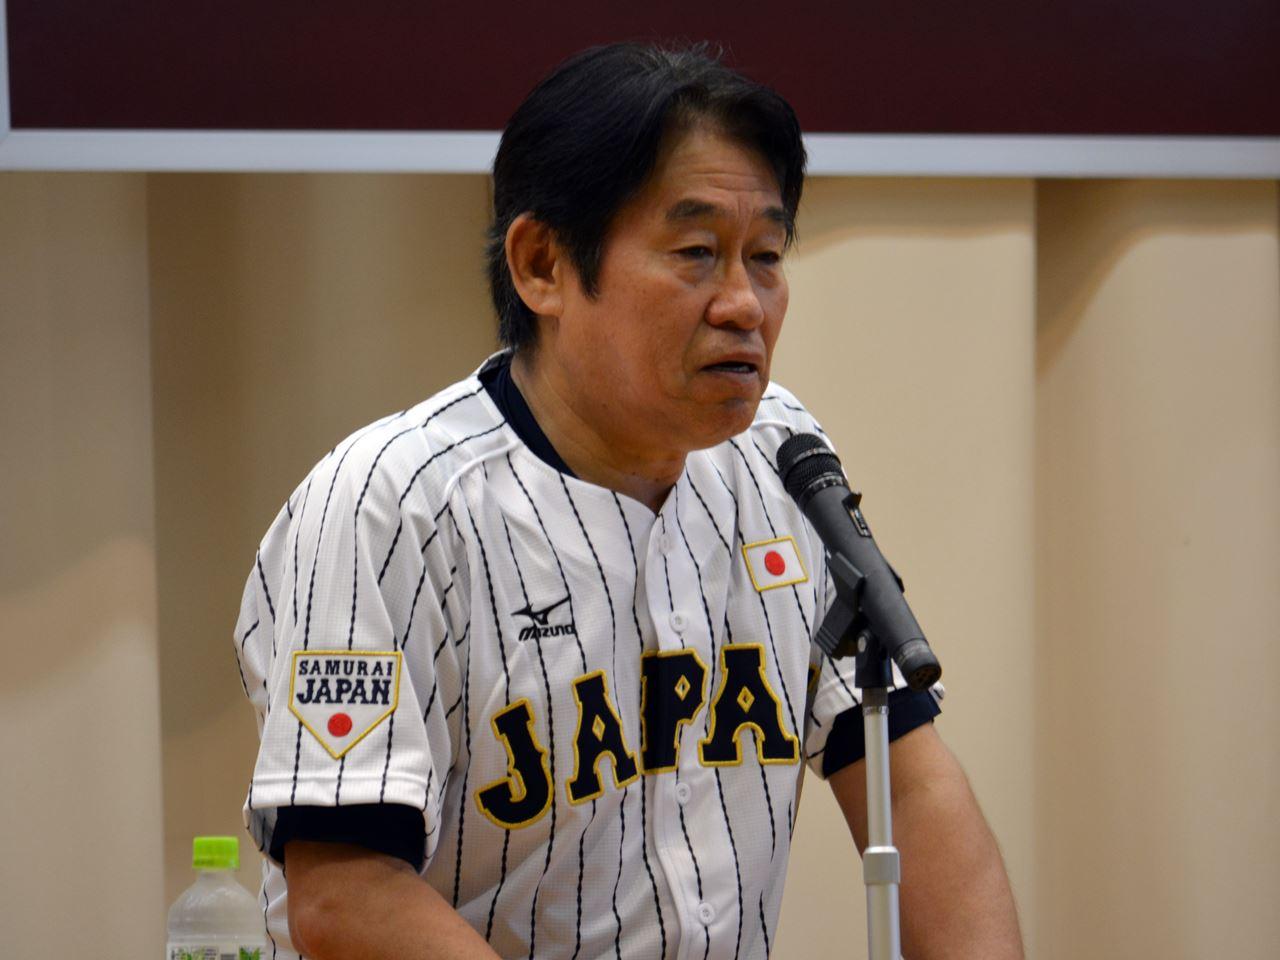 Japan announces U-15 World Cup team